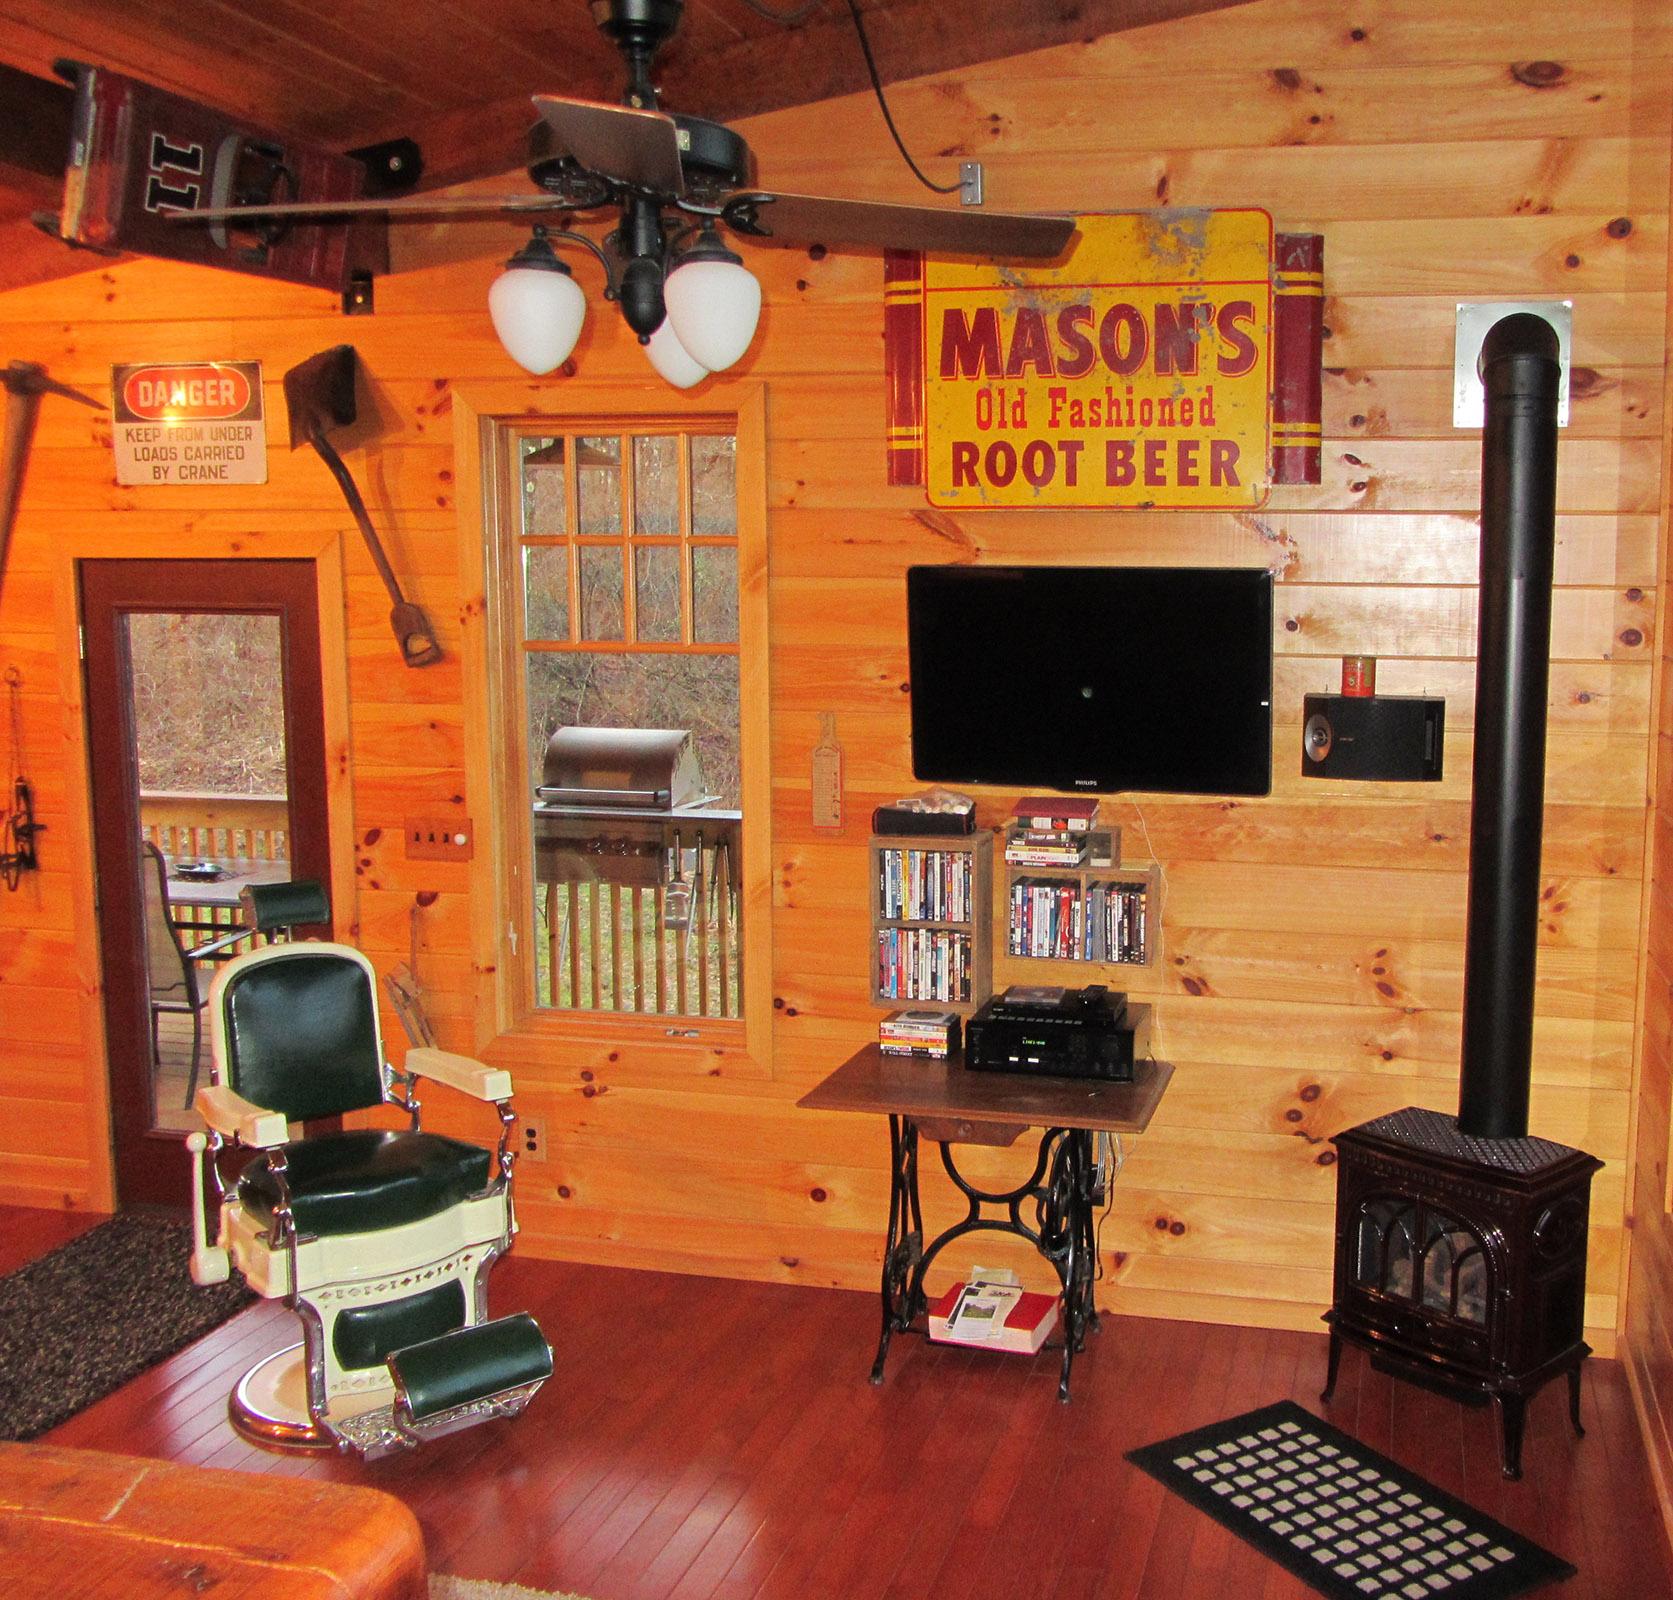 retreat hidden cabin in gem ohio cabins llc carefree log hocking hills romantic